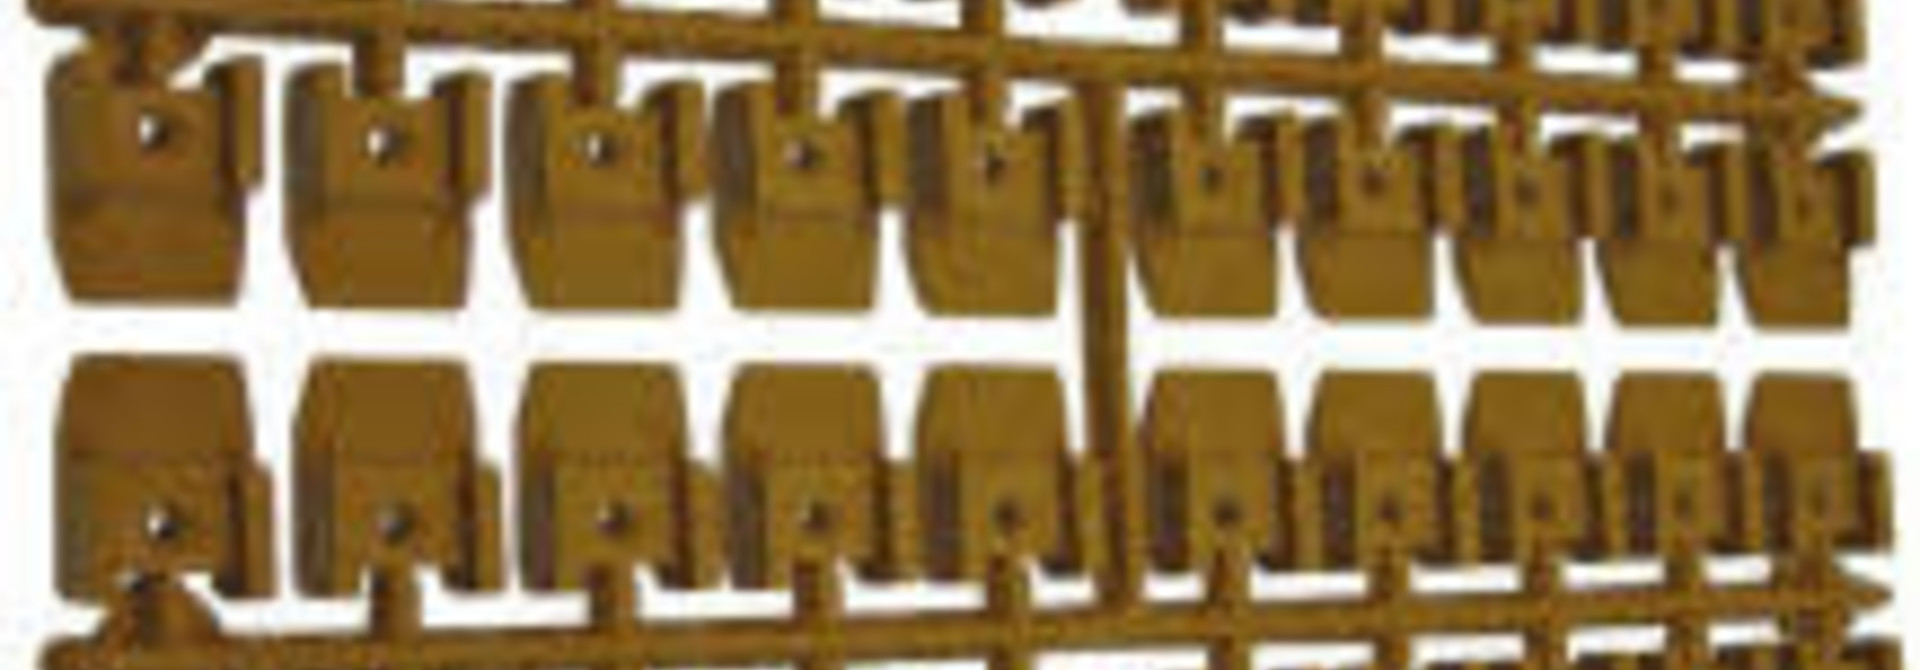 Nicot center clips - 40 stuks